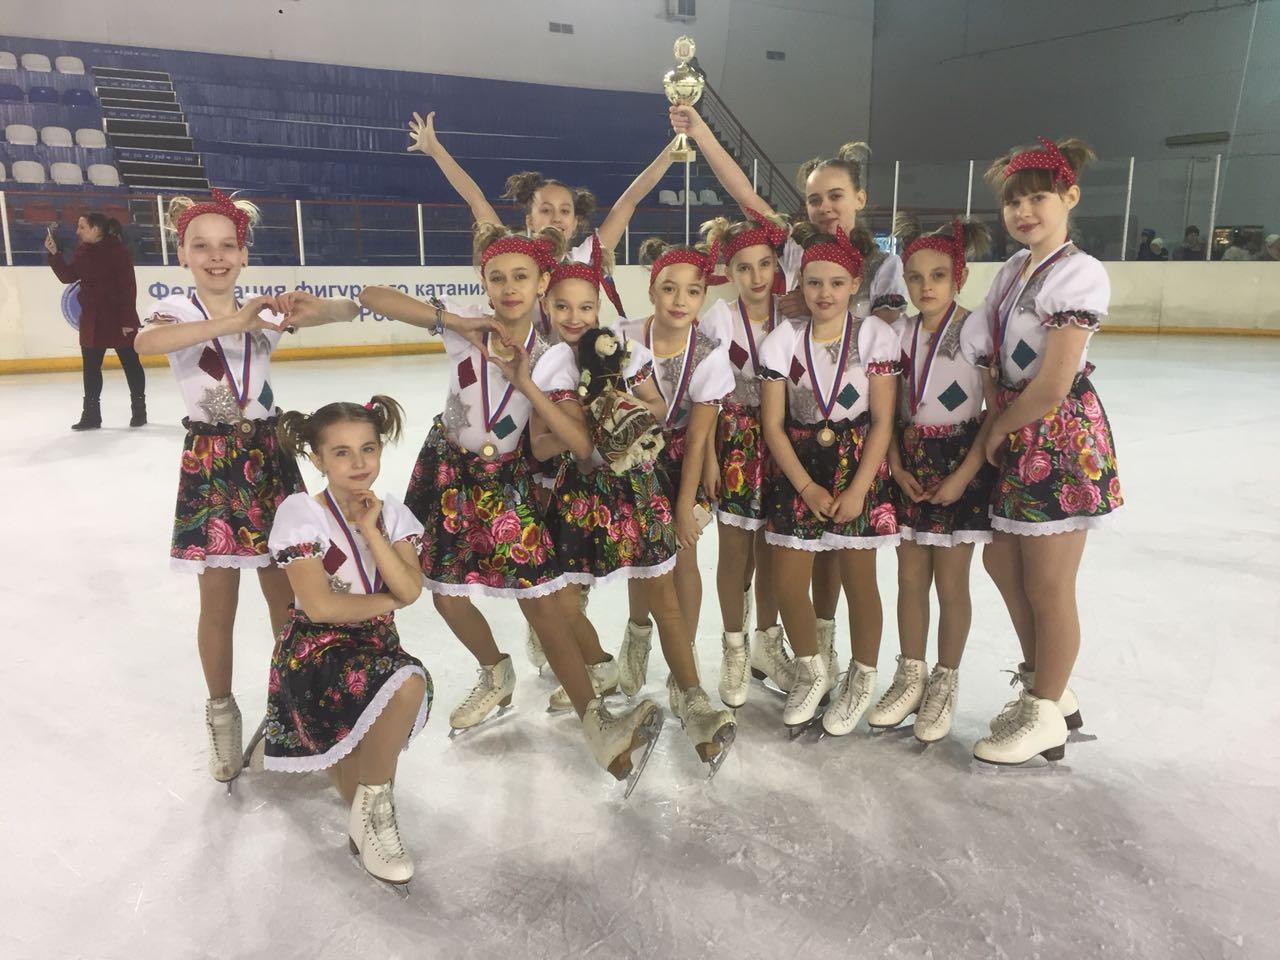 Северчанки заняли 3 место на турнире по синхронному катанию на коньках